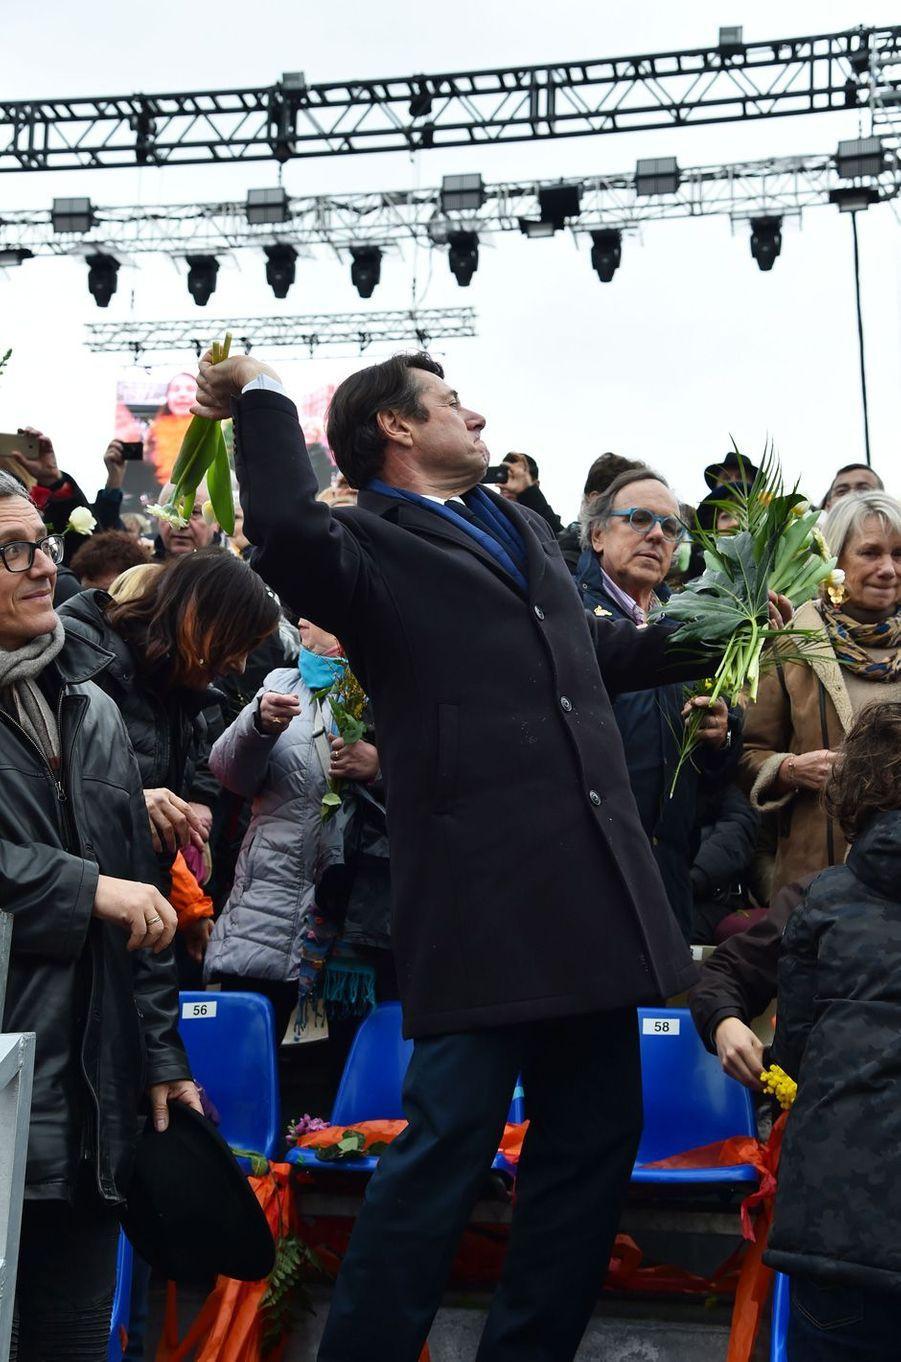 Christian Estrosisamedi à la première bataillede fleurs du Carnaval de Nice.